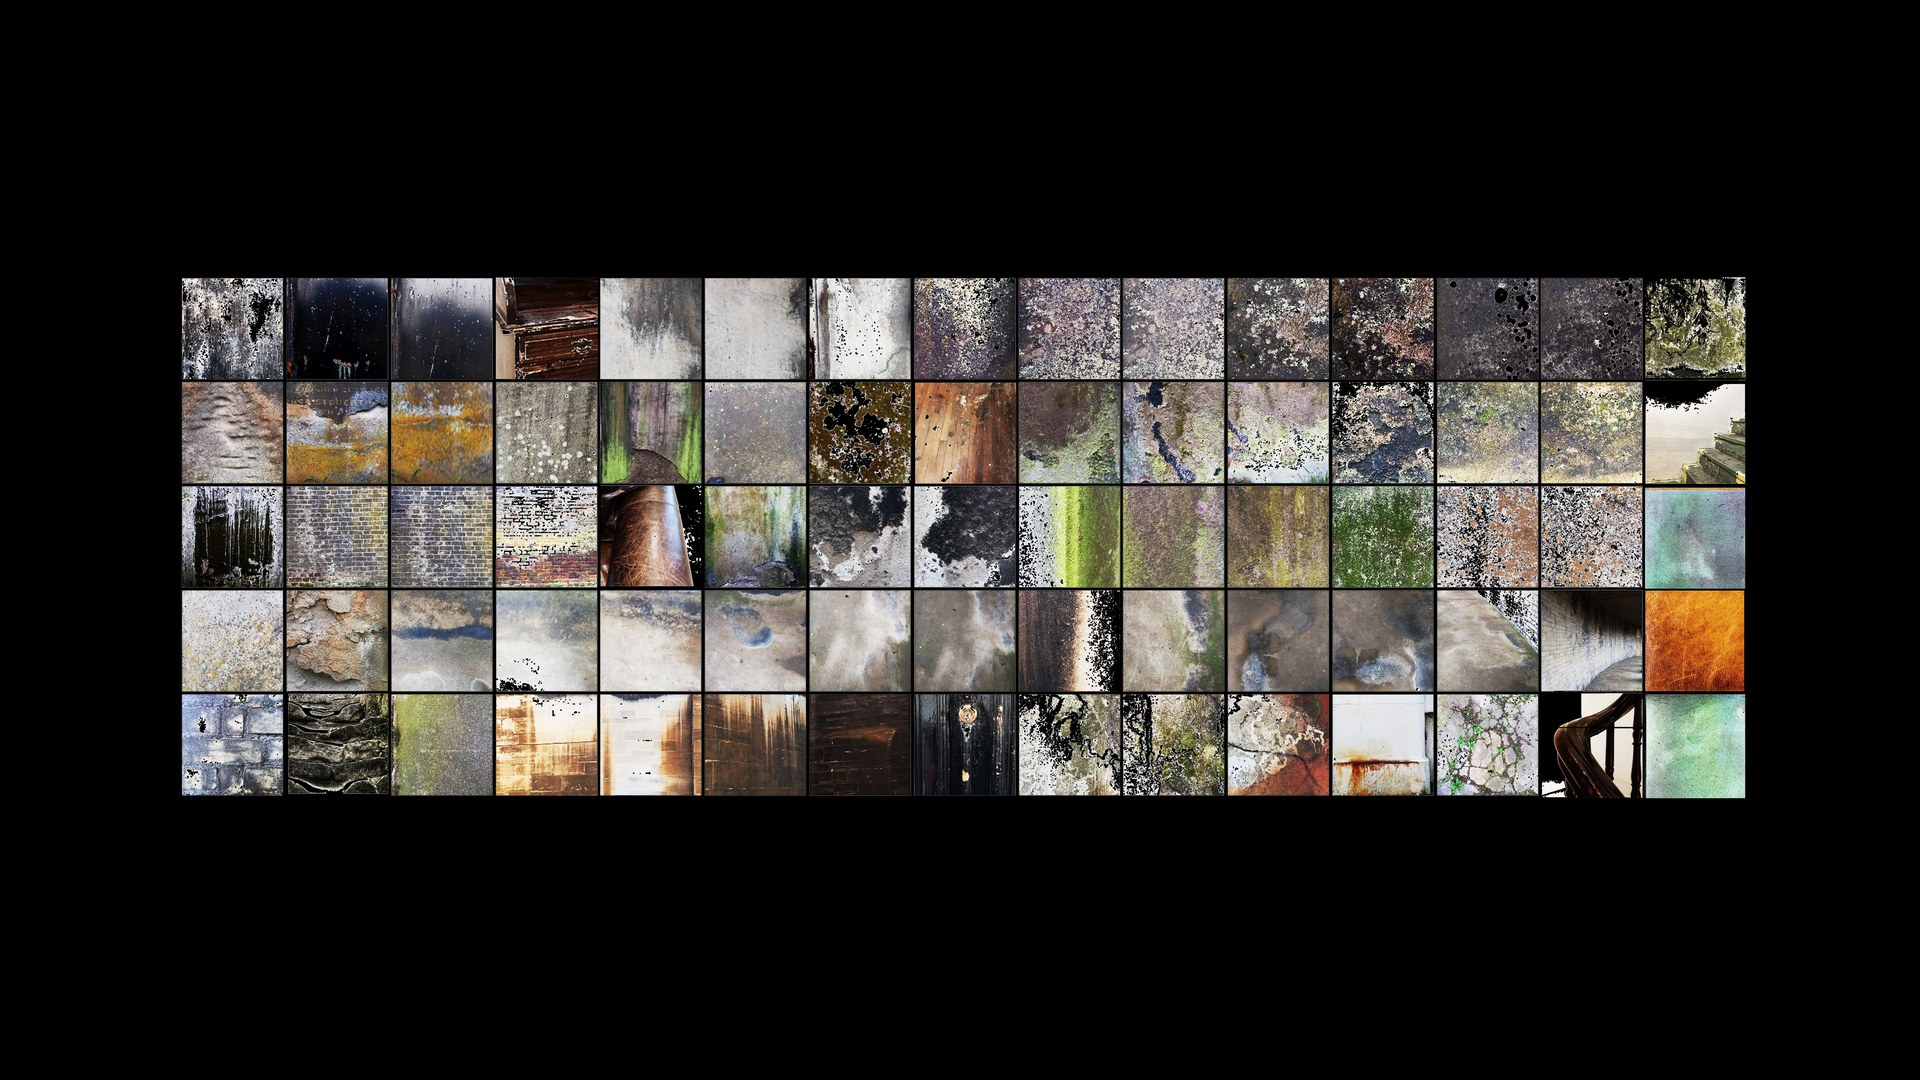 Documentation of destruction processes